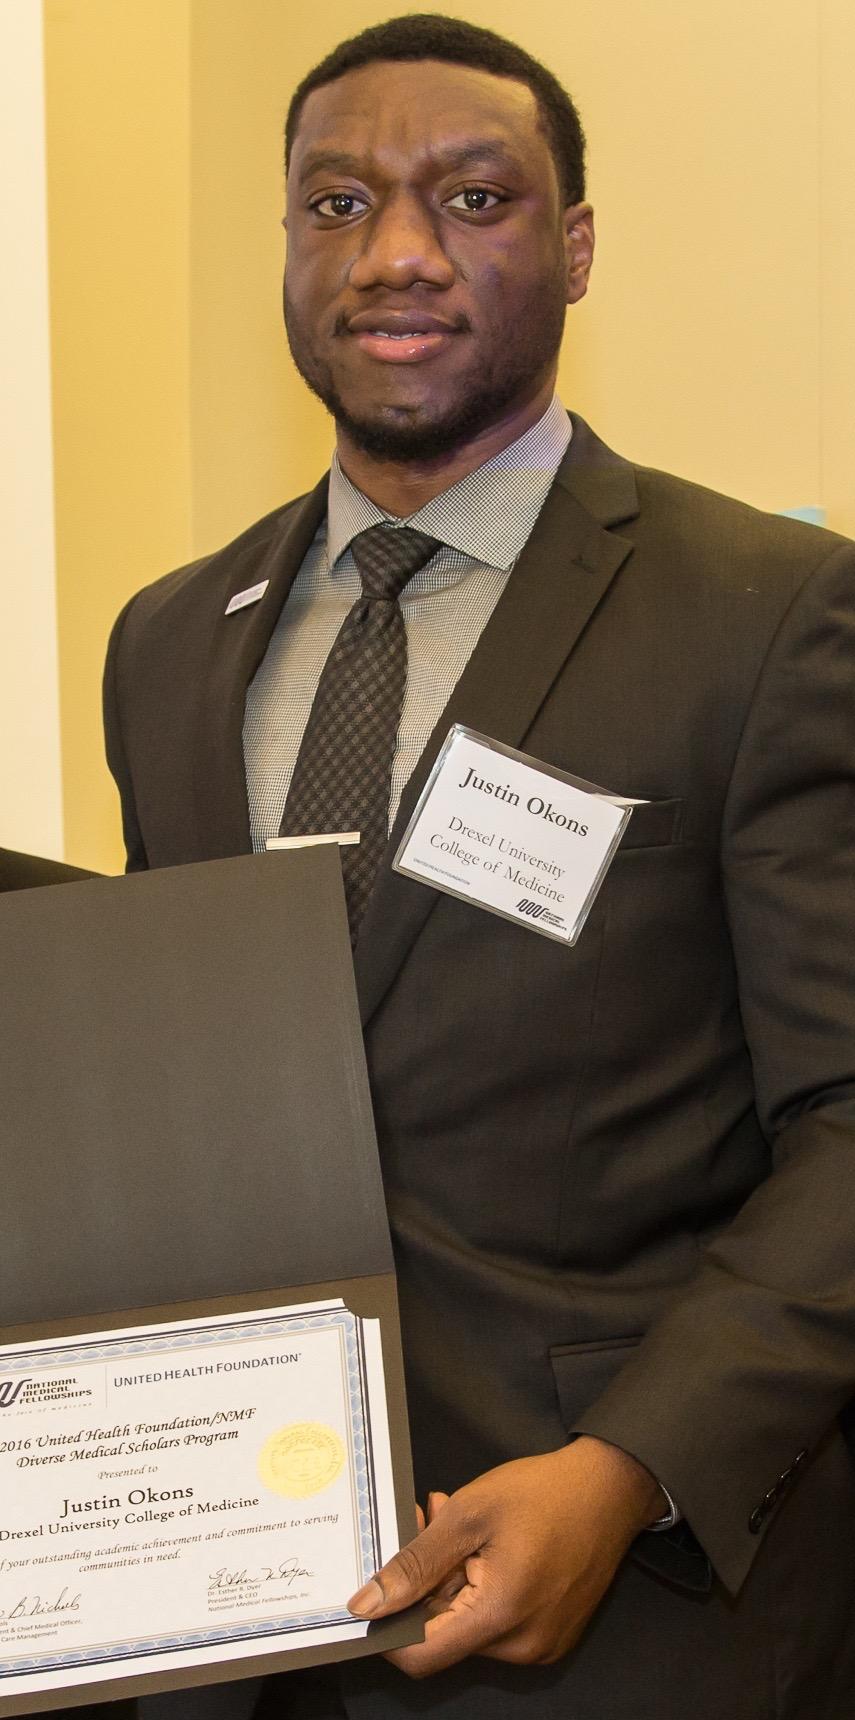 Justin Okons, UNC Charlotte c/o 2011, B.S. Biology